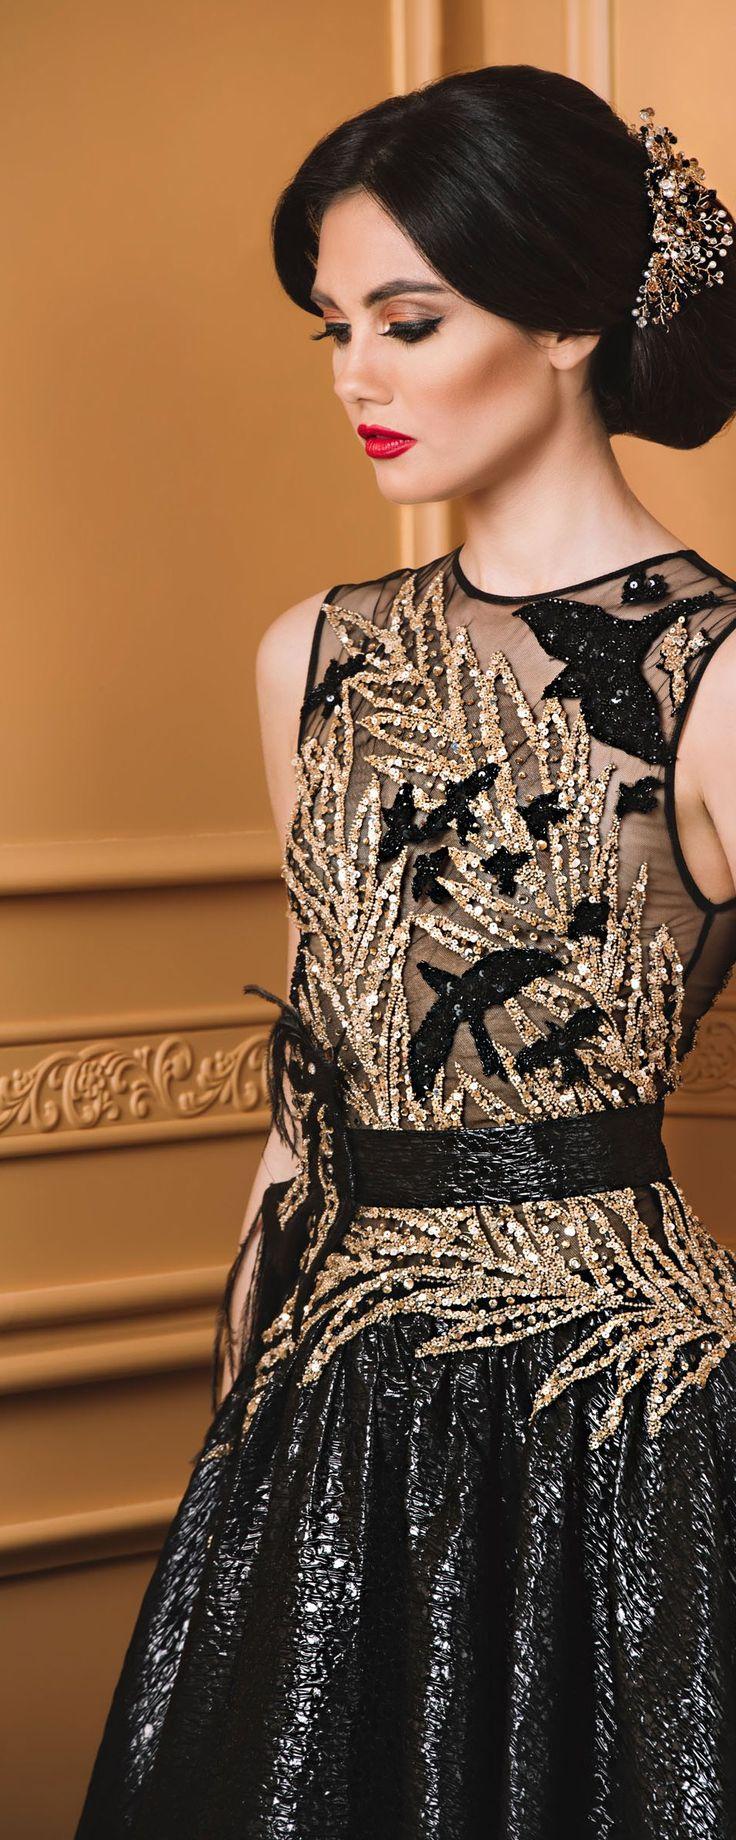 Best 131 dress images on Pinterest | Short wedding gowns, Wedding ...